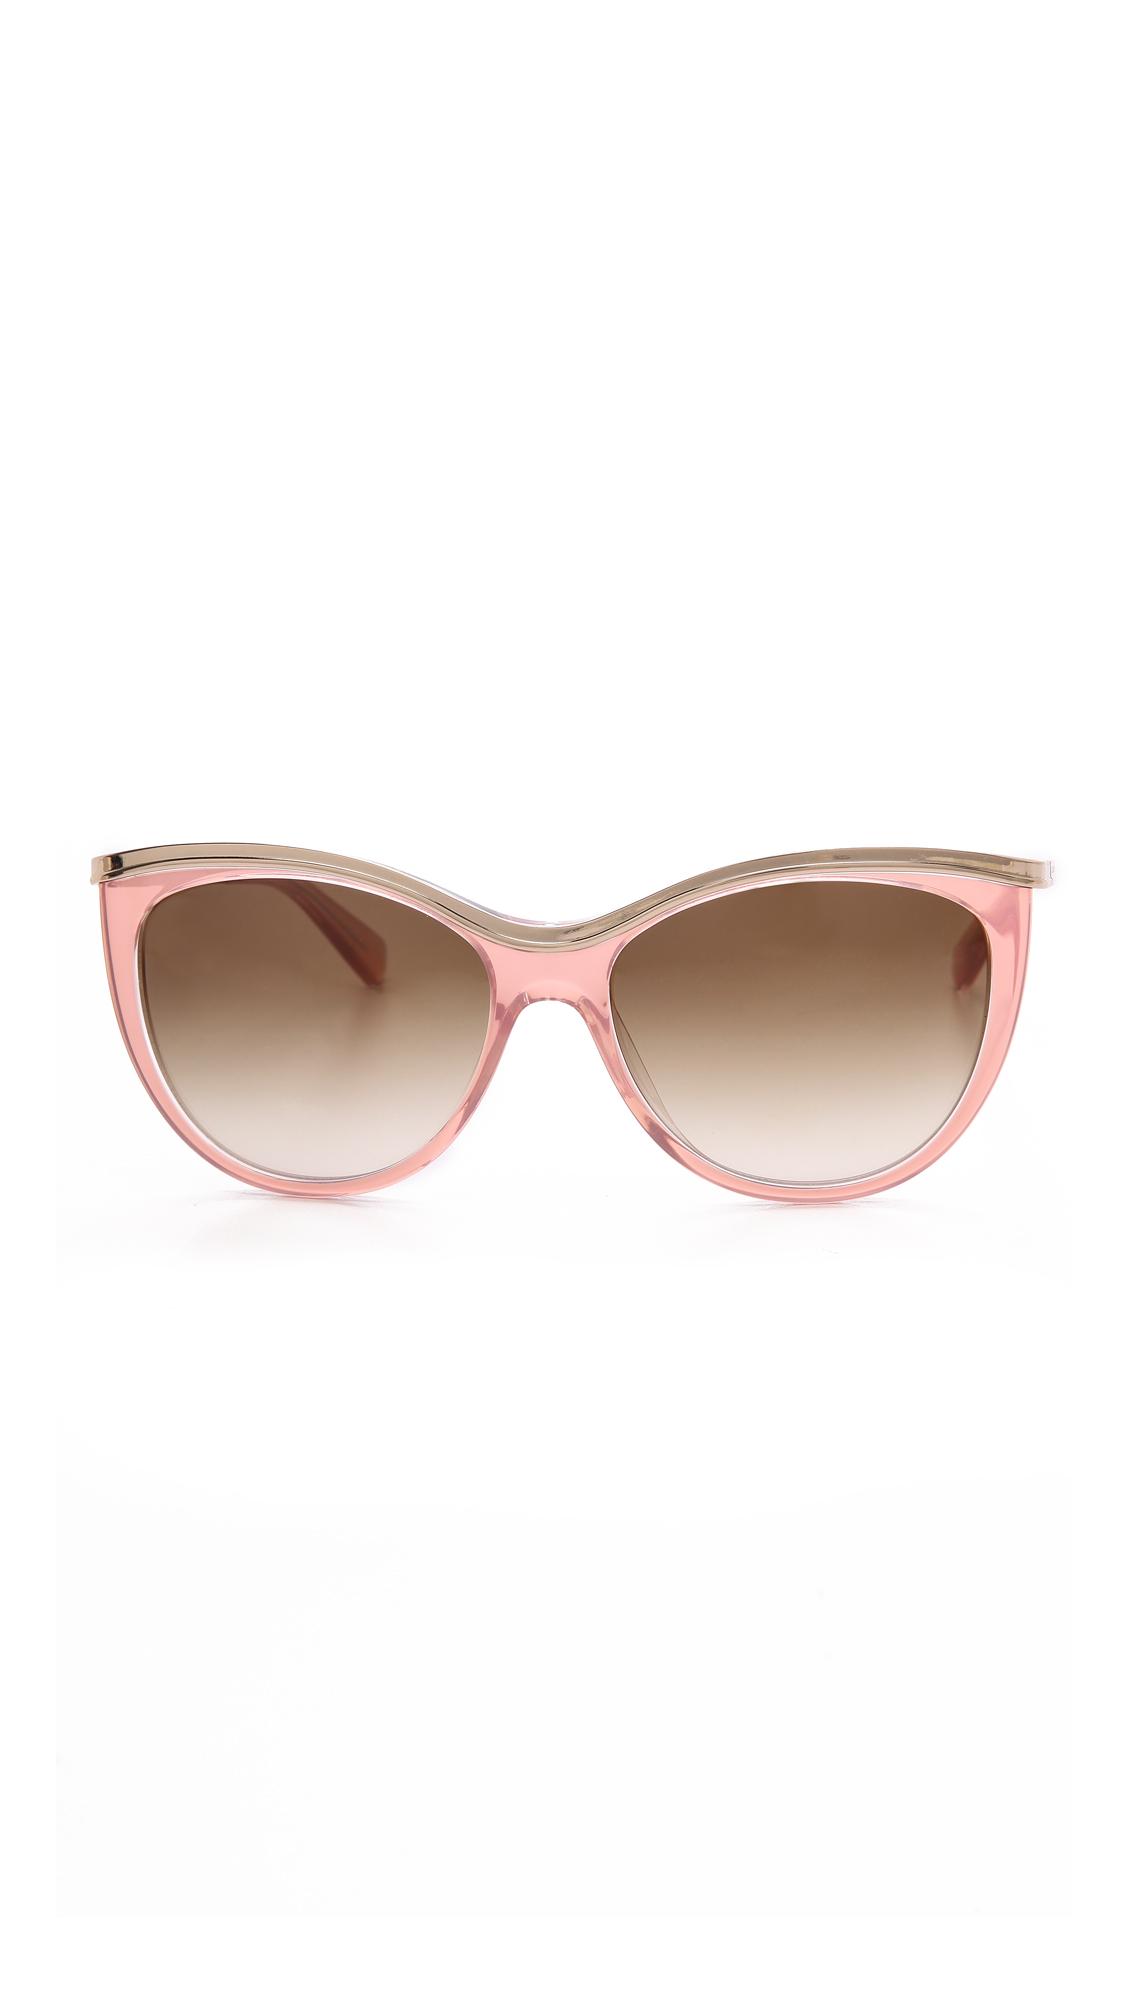 Kate spade new york Harmony Sunglasses Neutralbrown ...